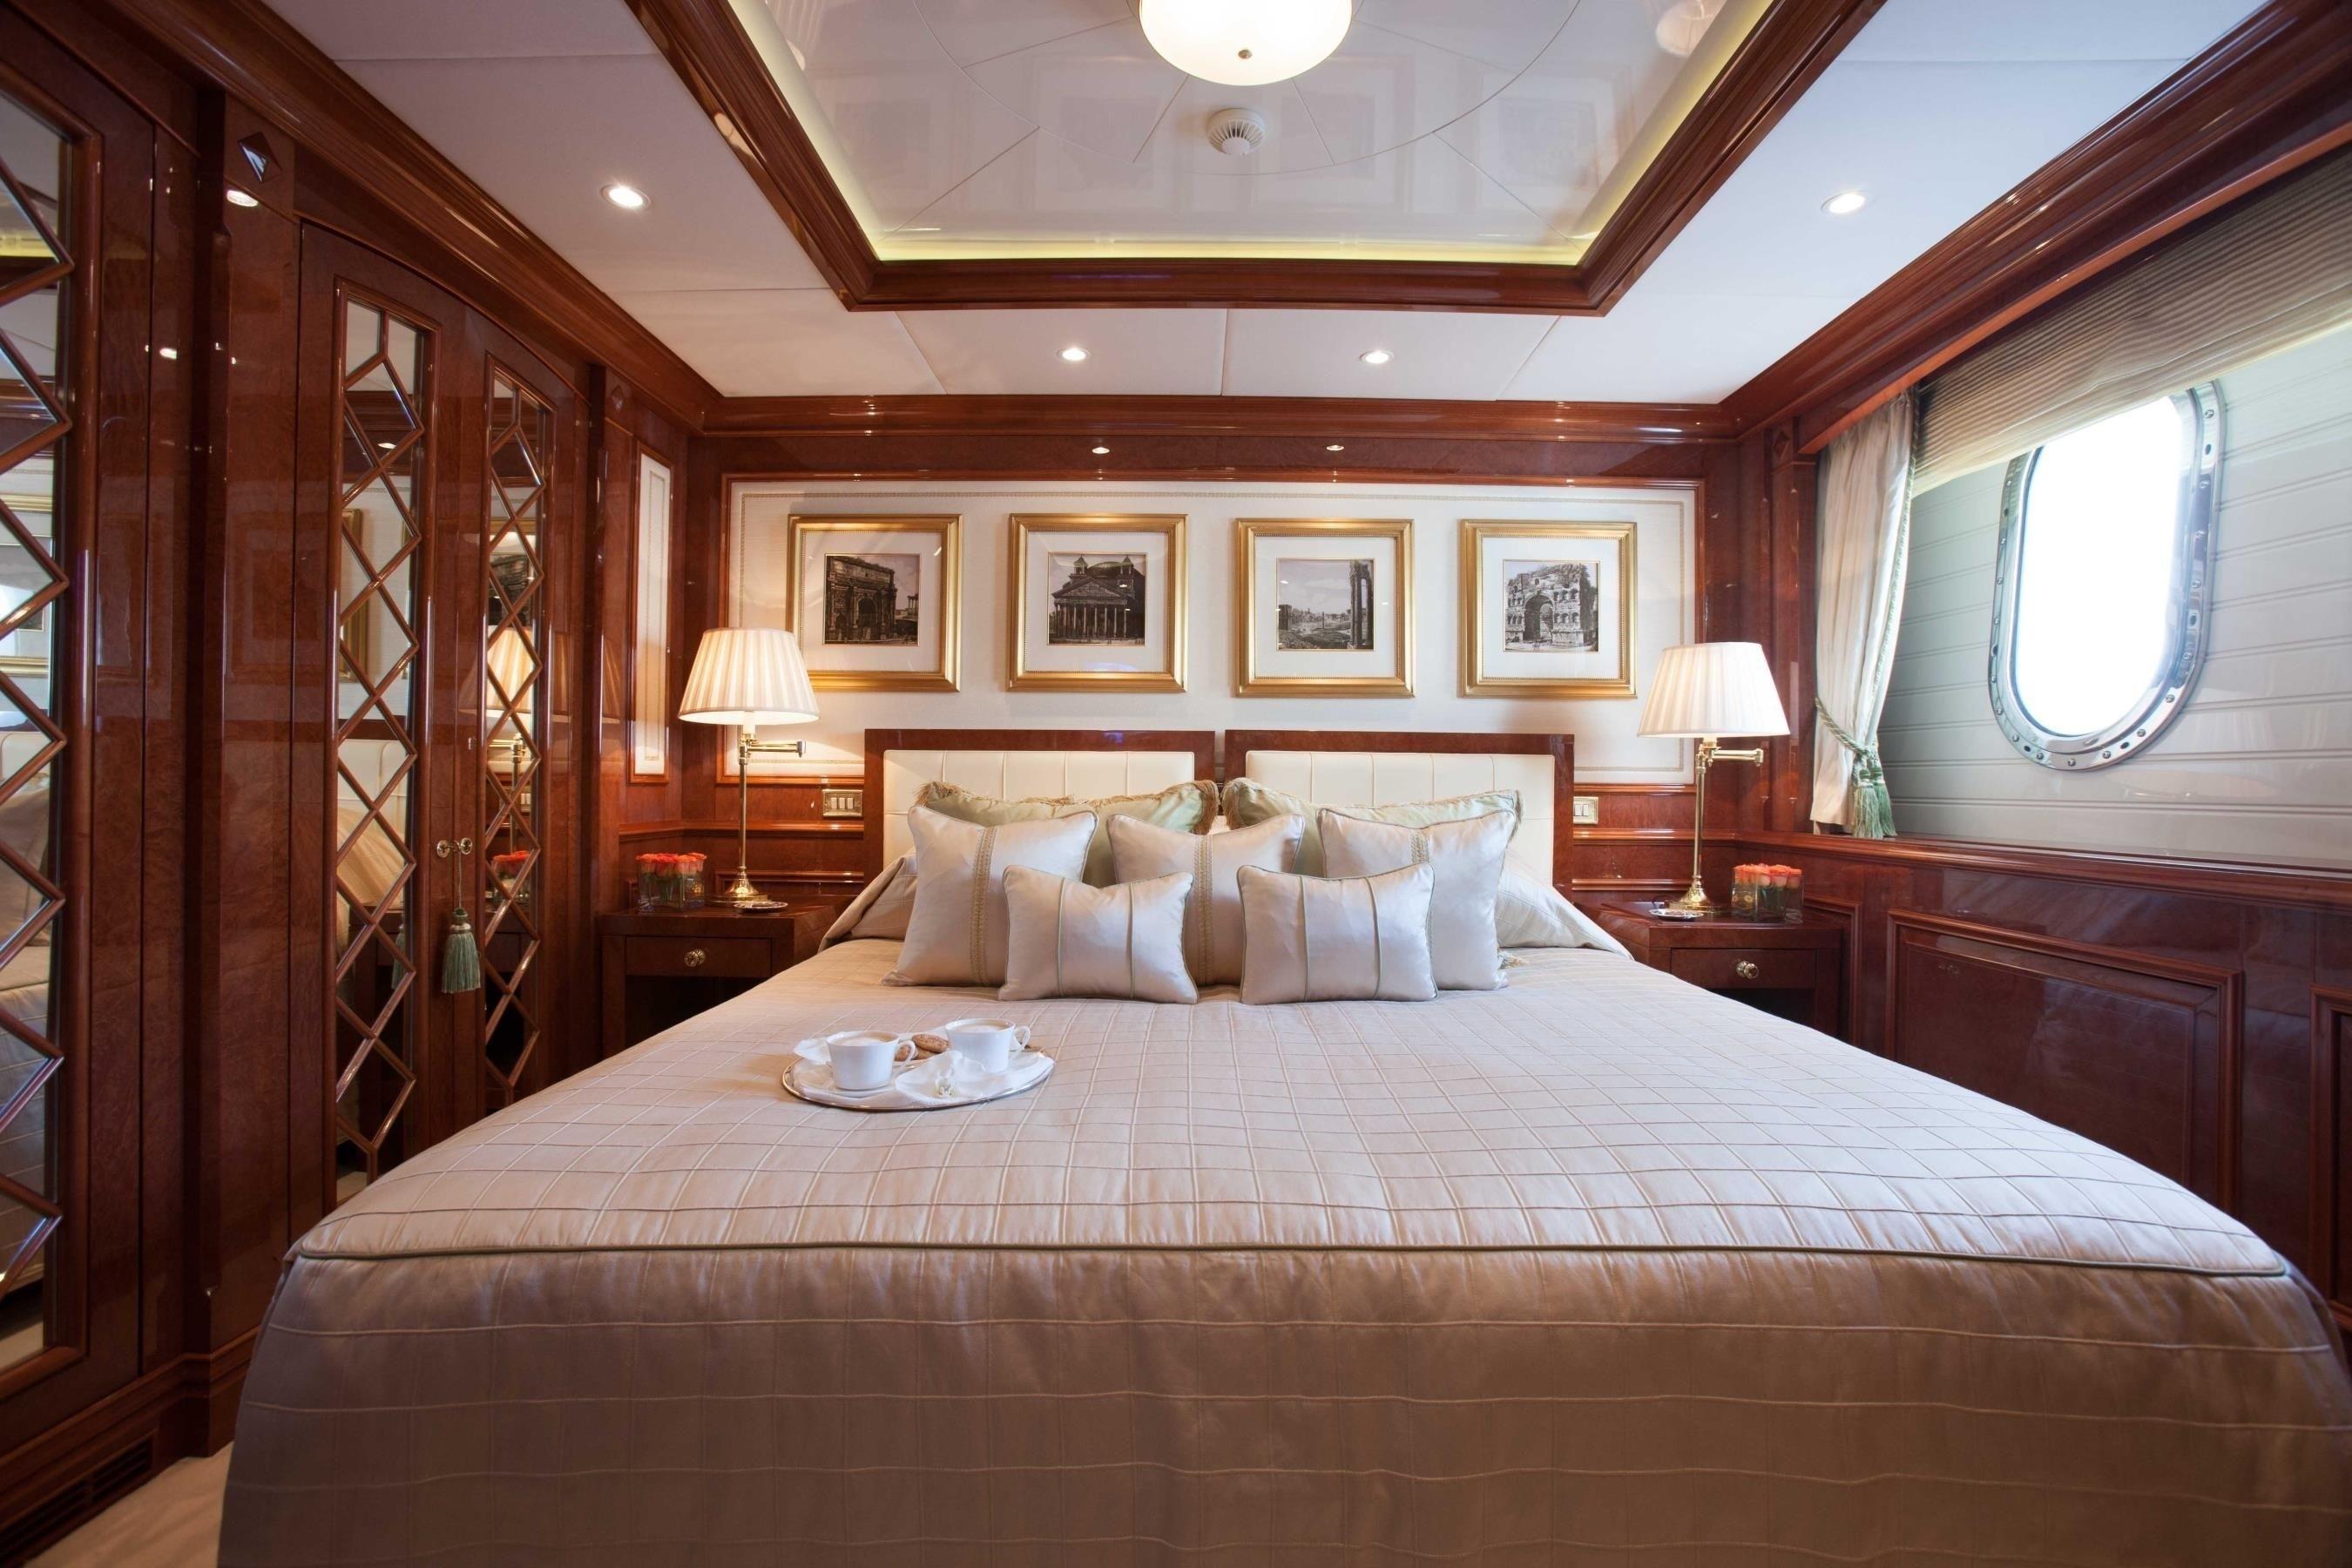 The 60m Yacht ST DAVID